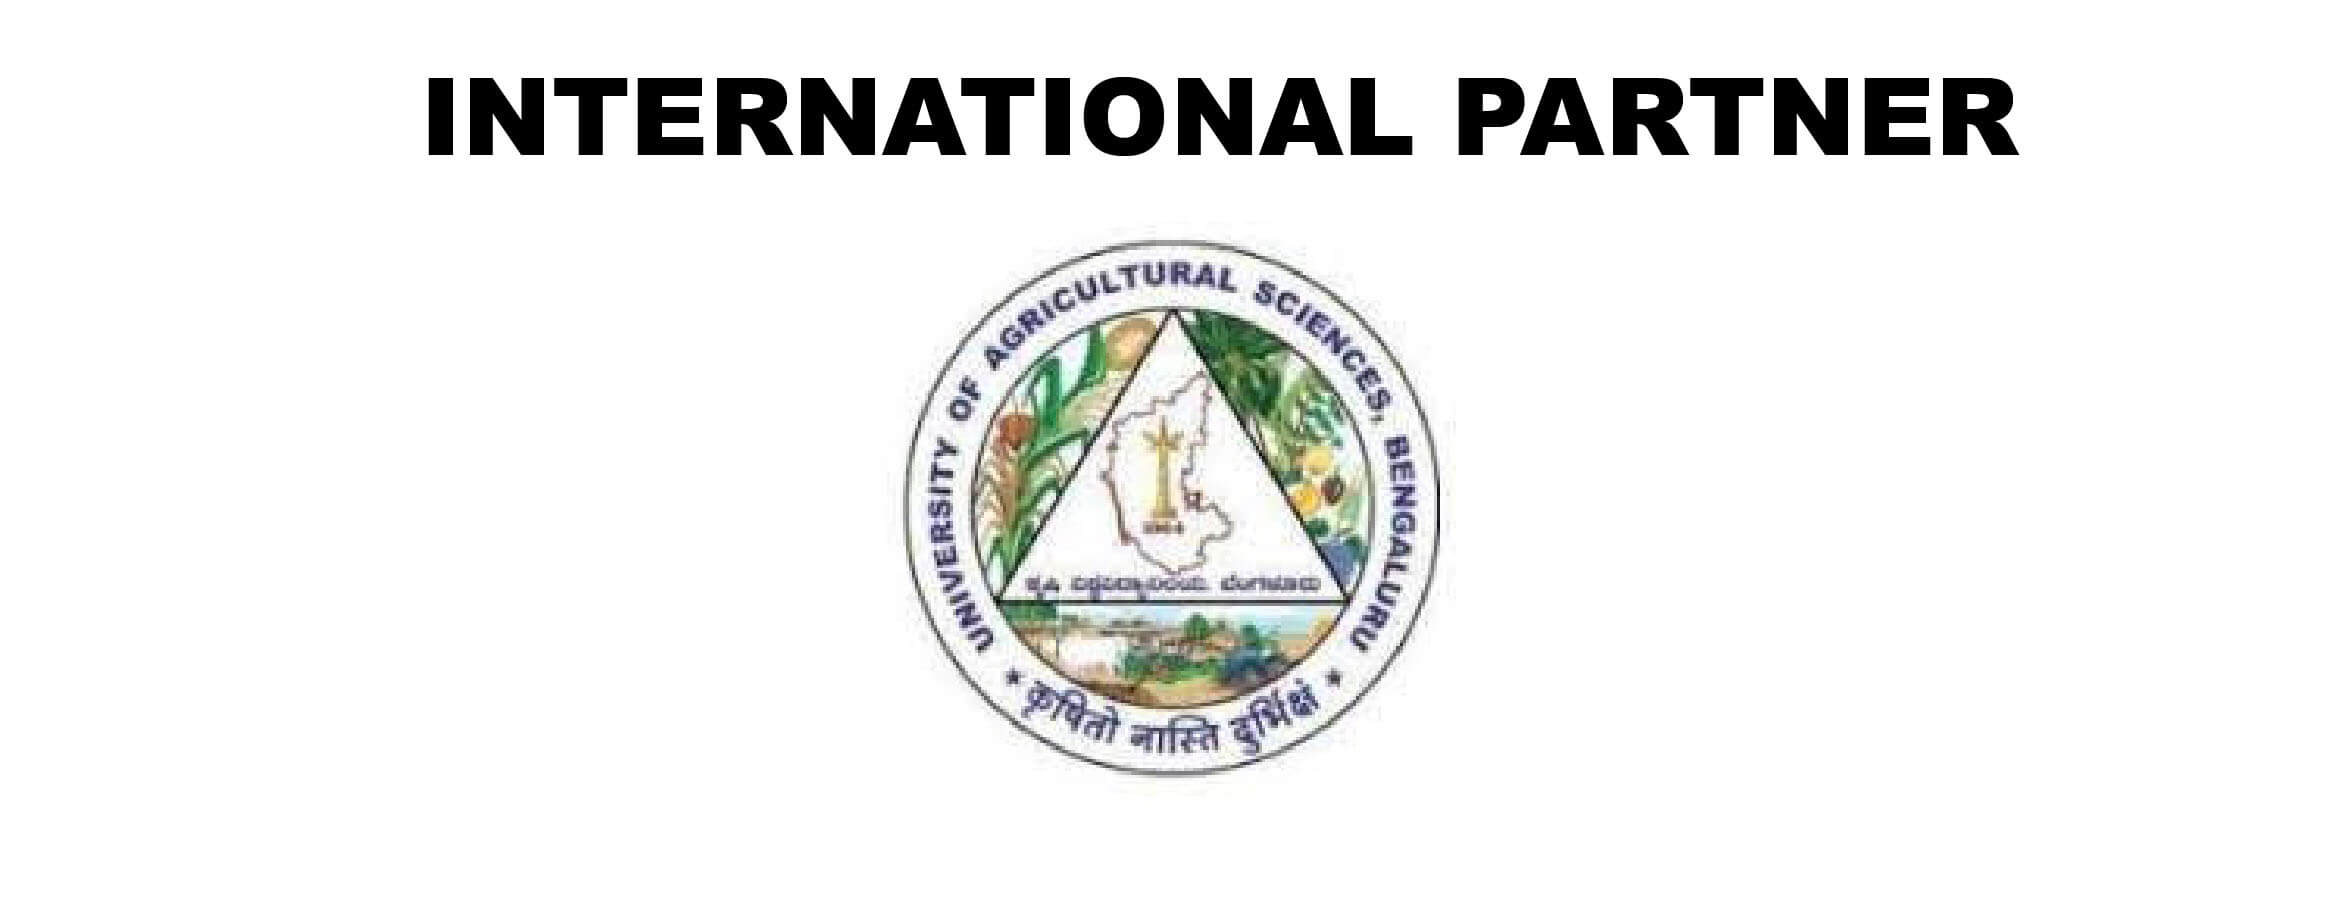 UASB logo copy